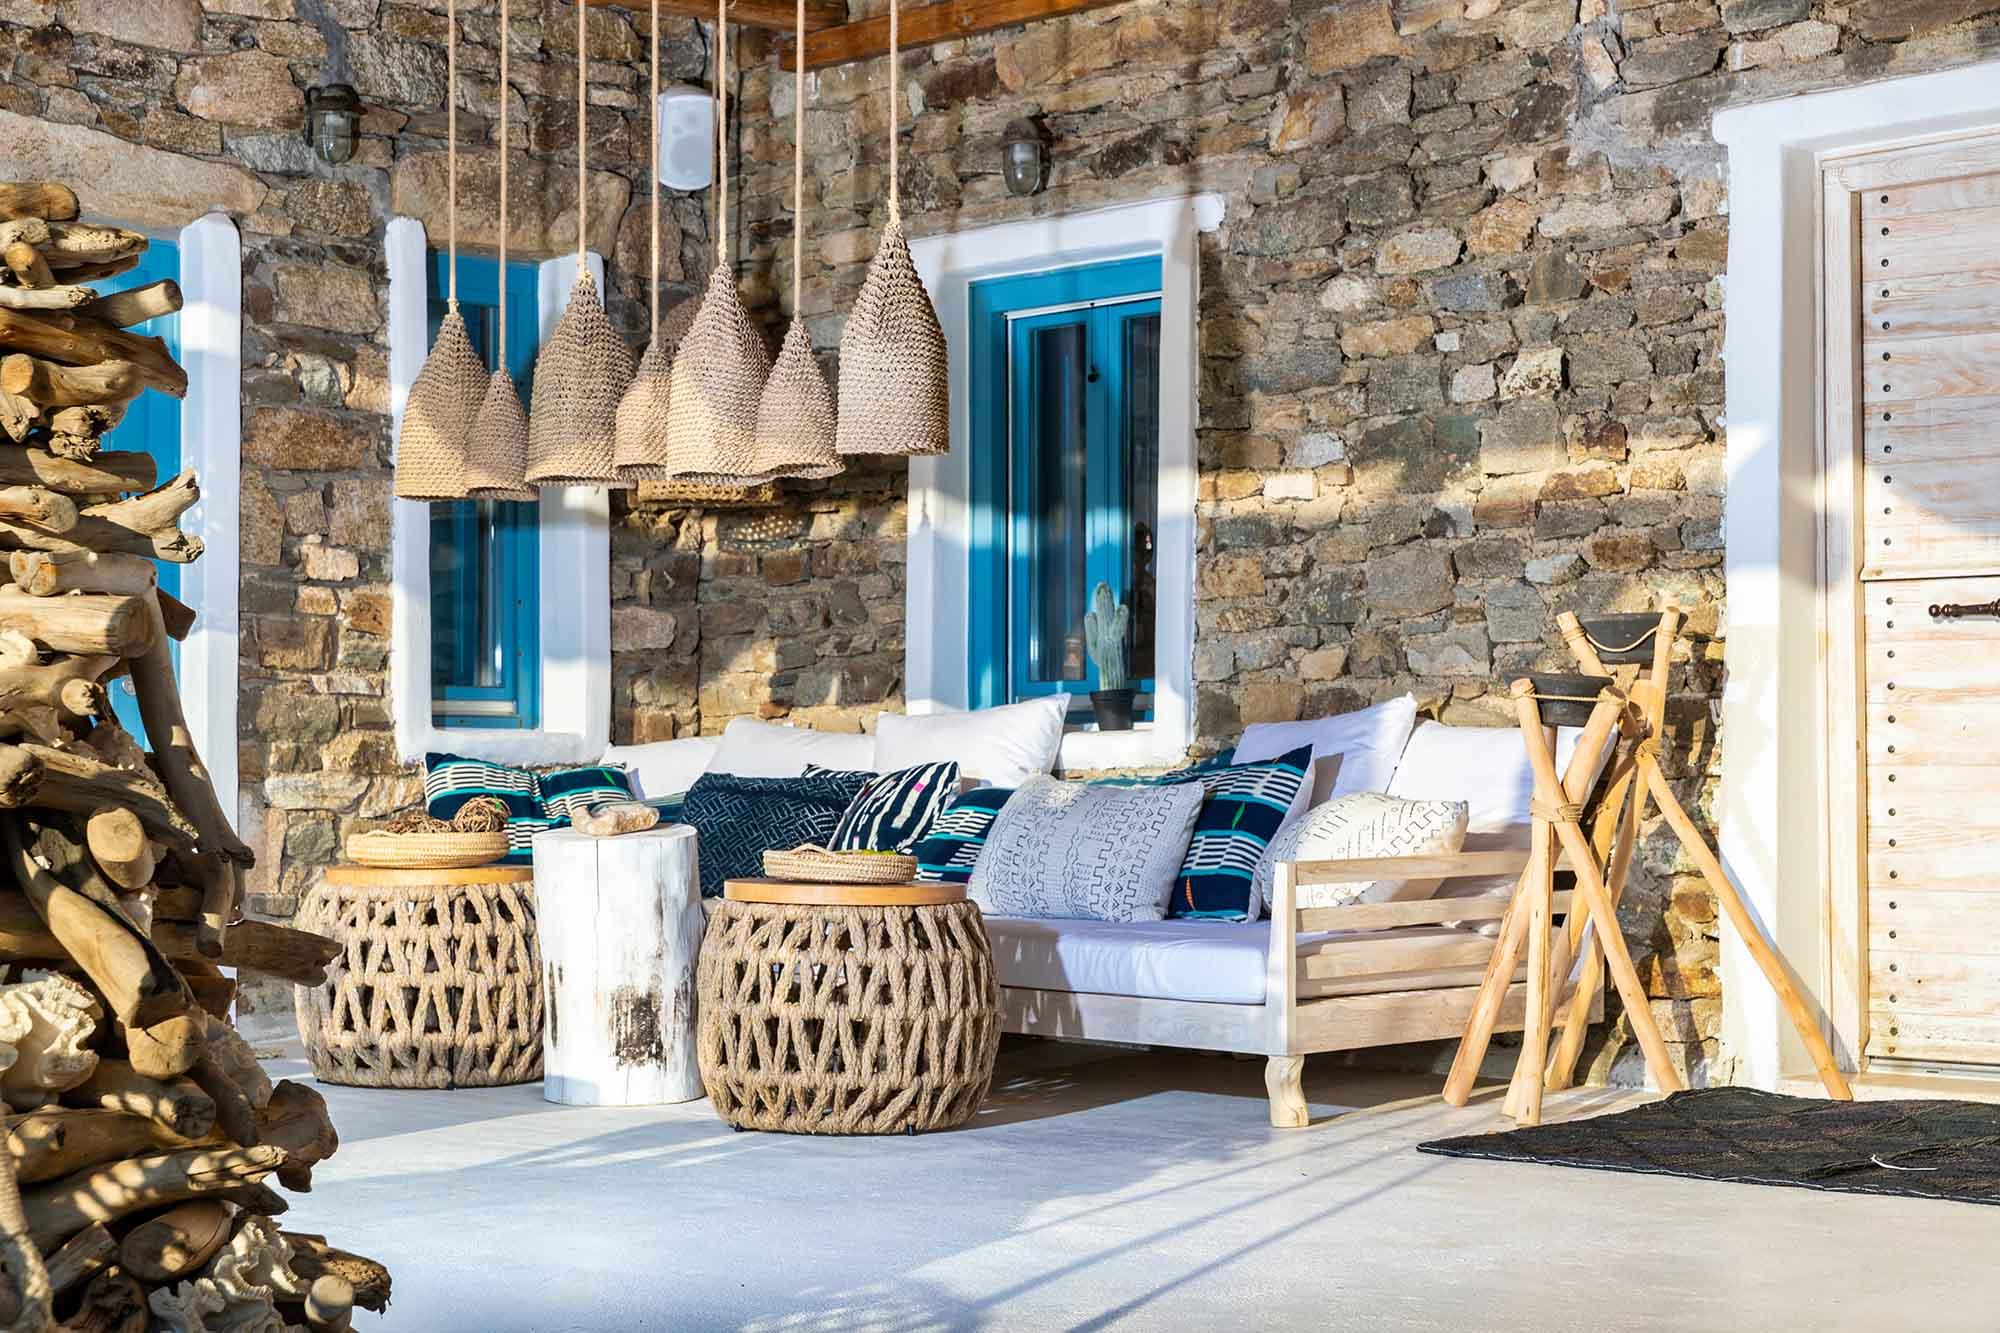 RENT A LUXURIOUS VILLA BY THE SEA IN MYKONOS - VILLA KARKOS - beautiful terrace